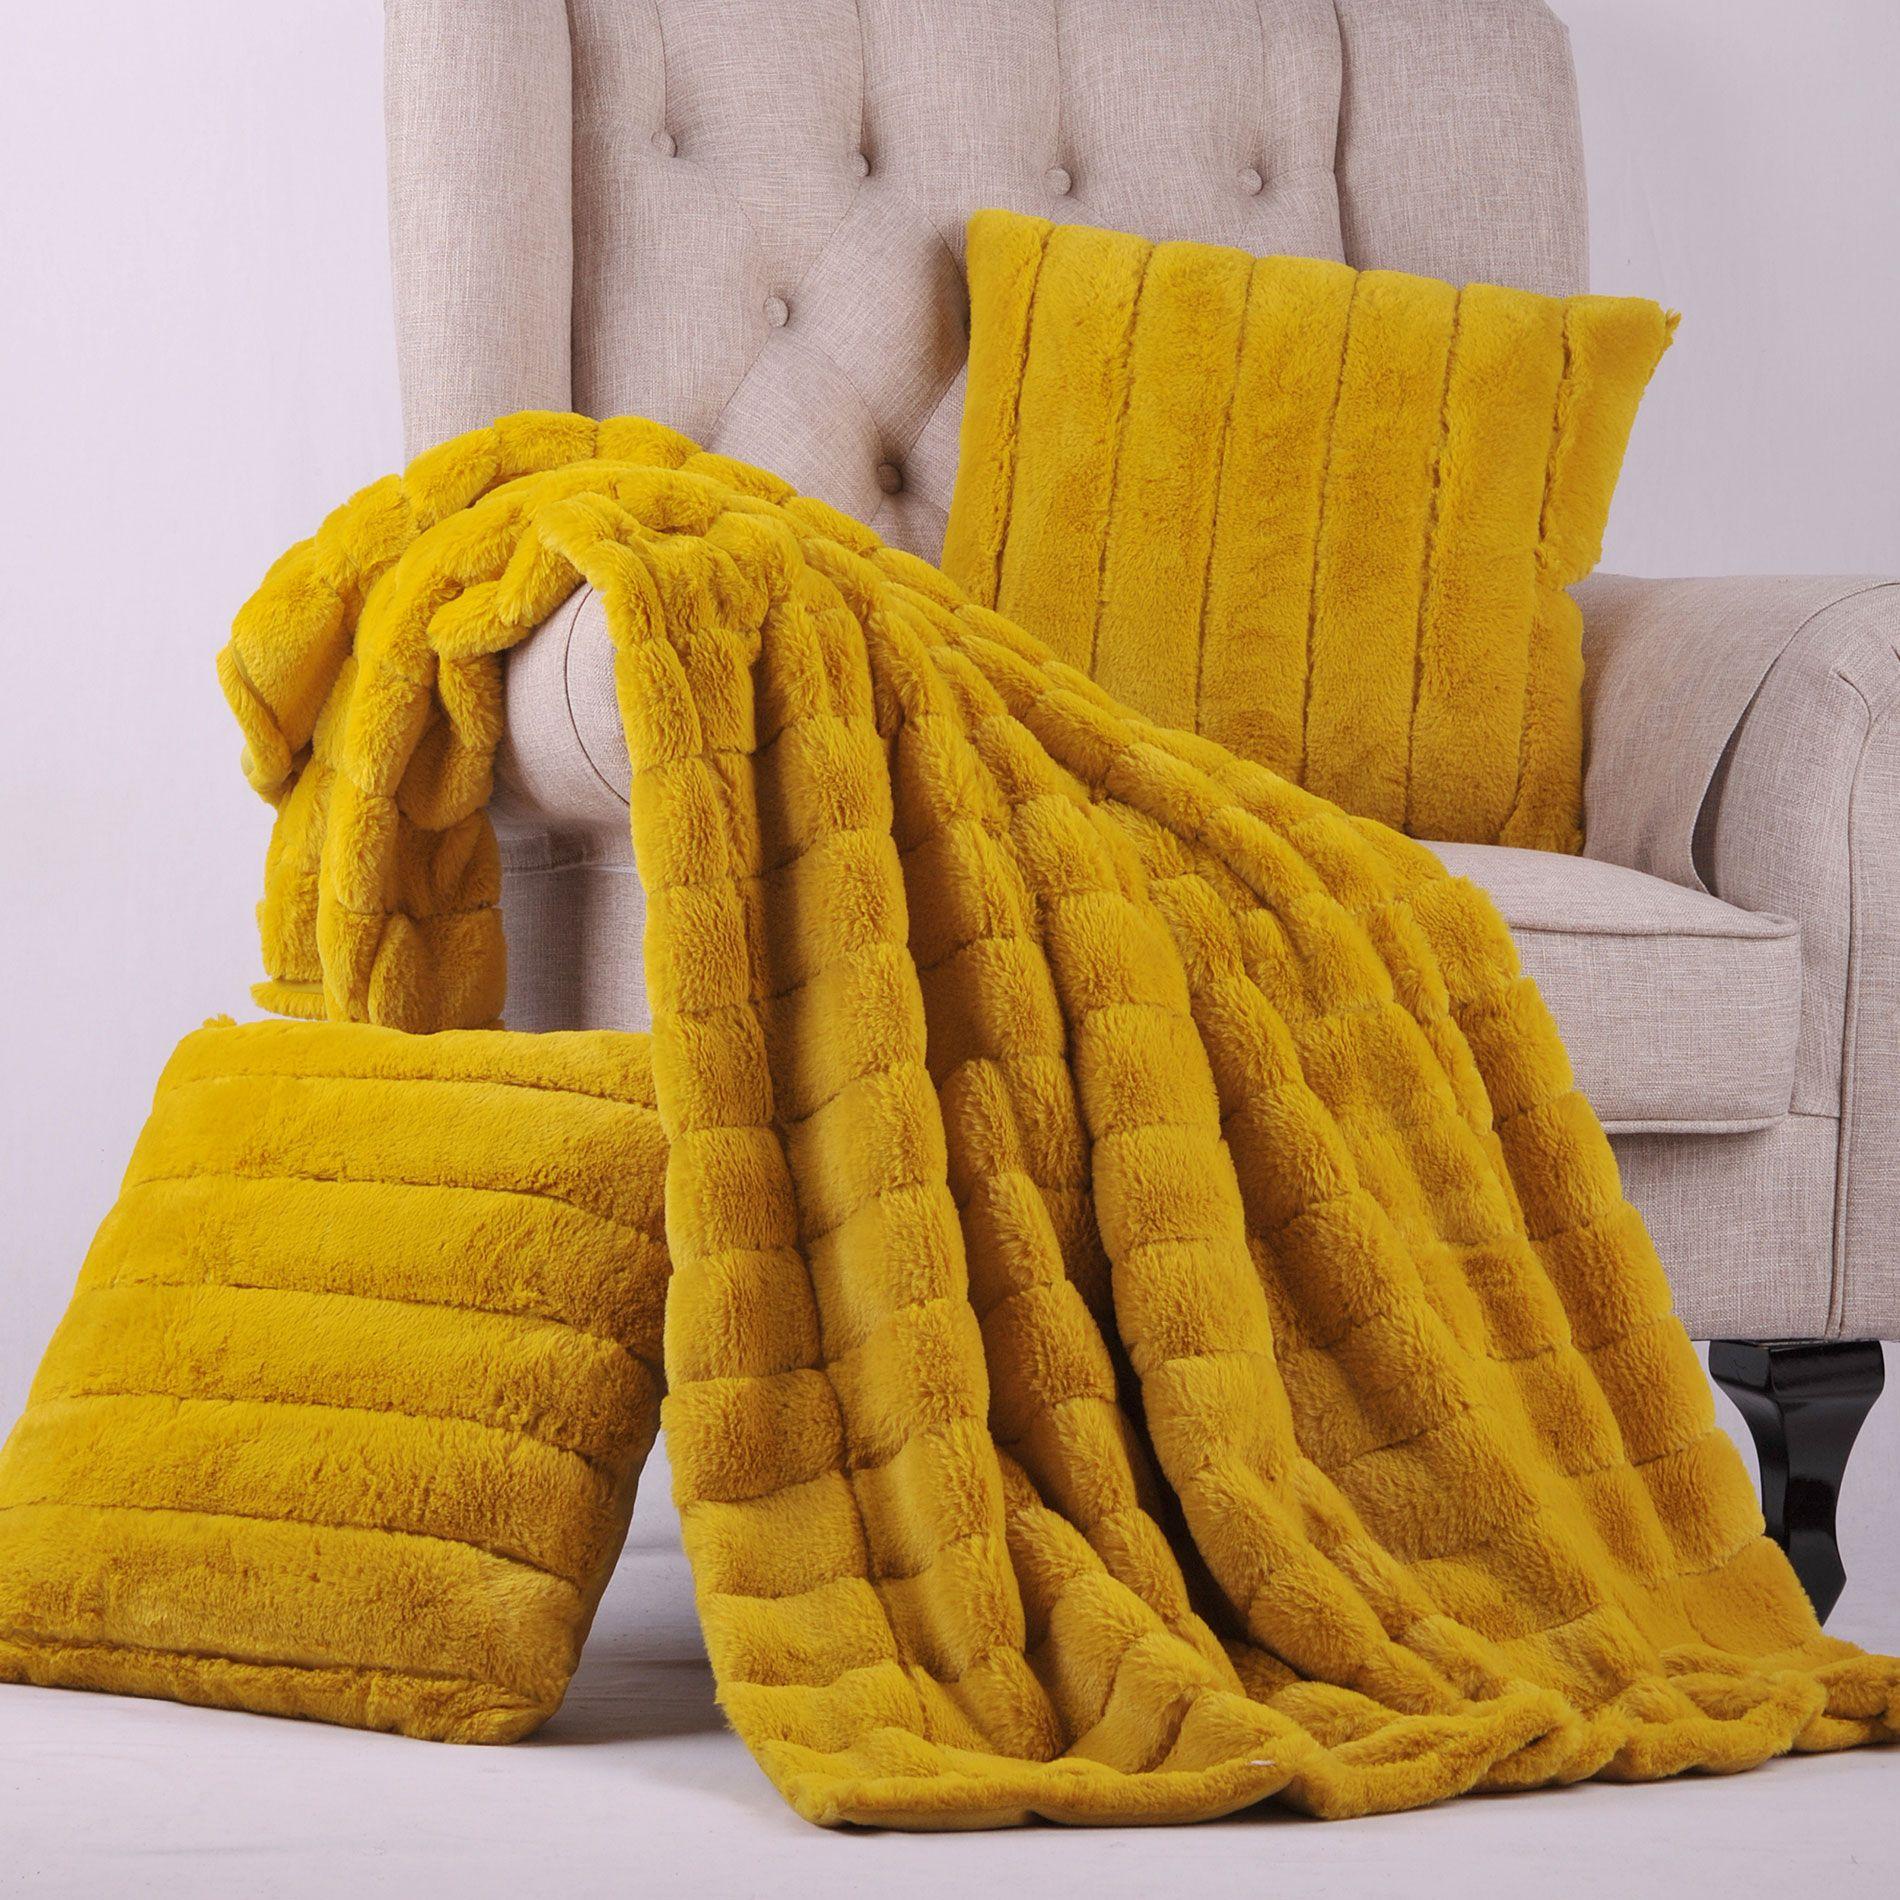 Lemon Curry Rabbit Faux Fur Throw Blanket And Pillow Set Combo The Rabbit Faux Fur Combination Set Is A Comple Pillow Combos Faux Fur Throw Fur Throw Pillows